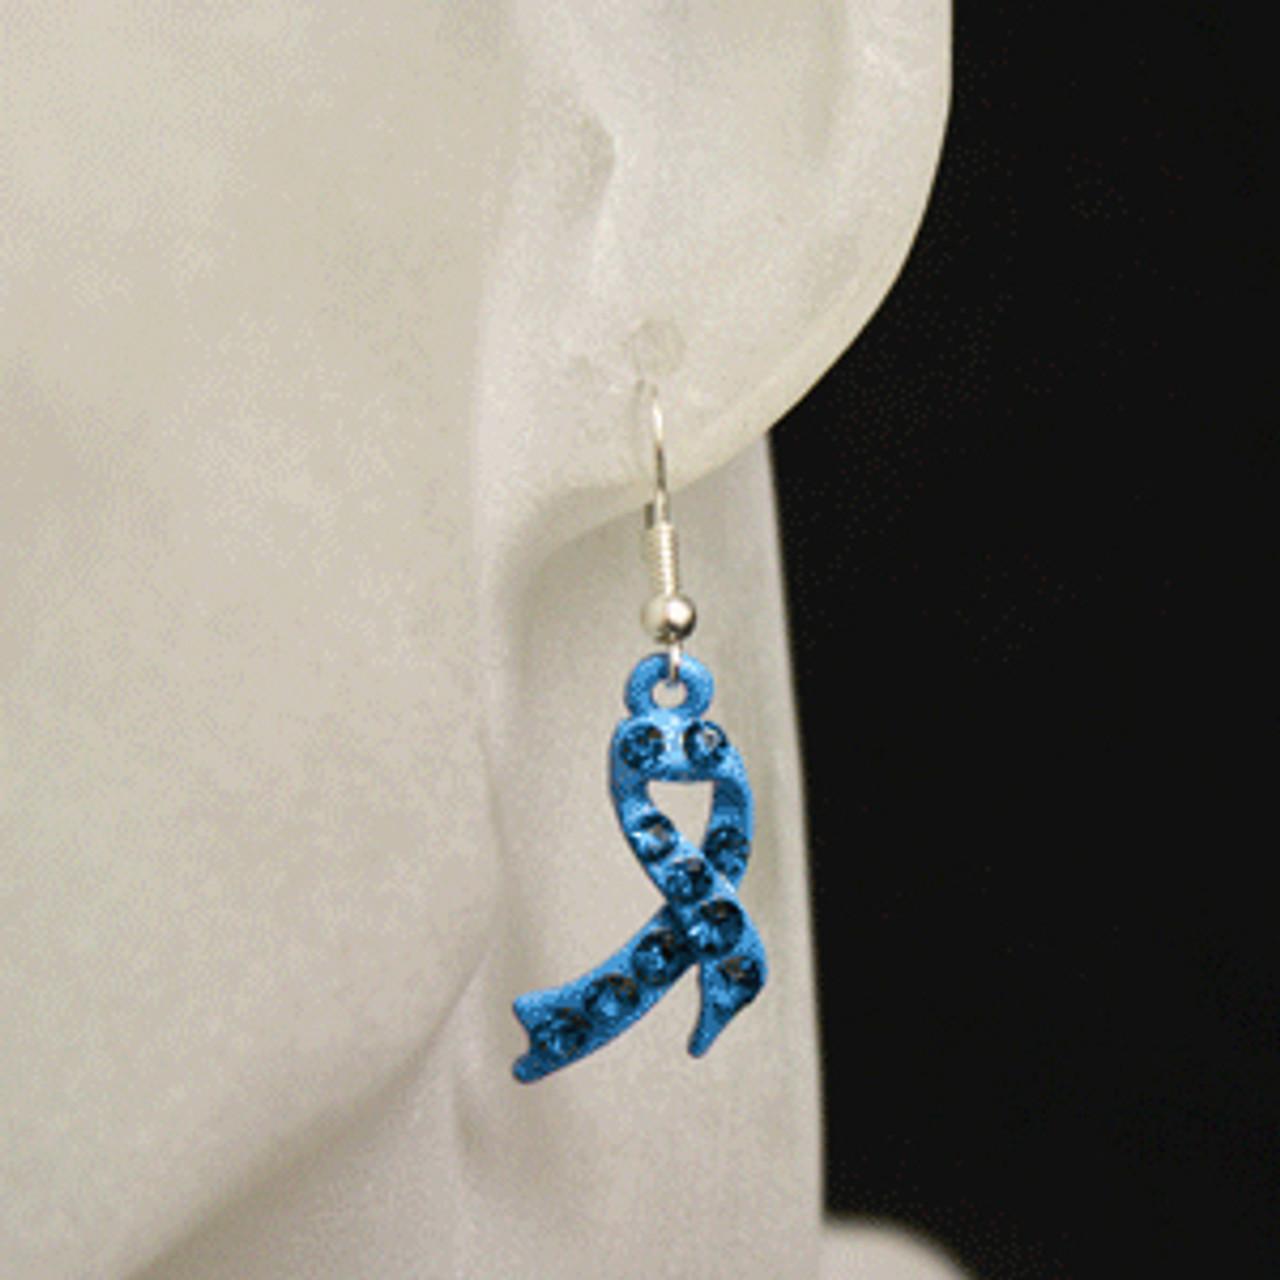 Blue charity or awareness ribbon earrings